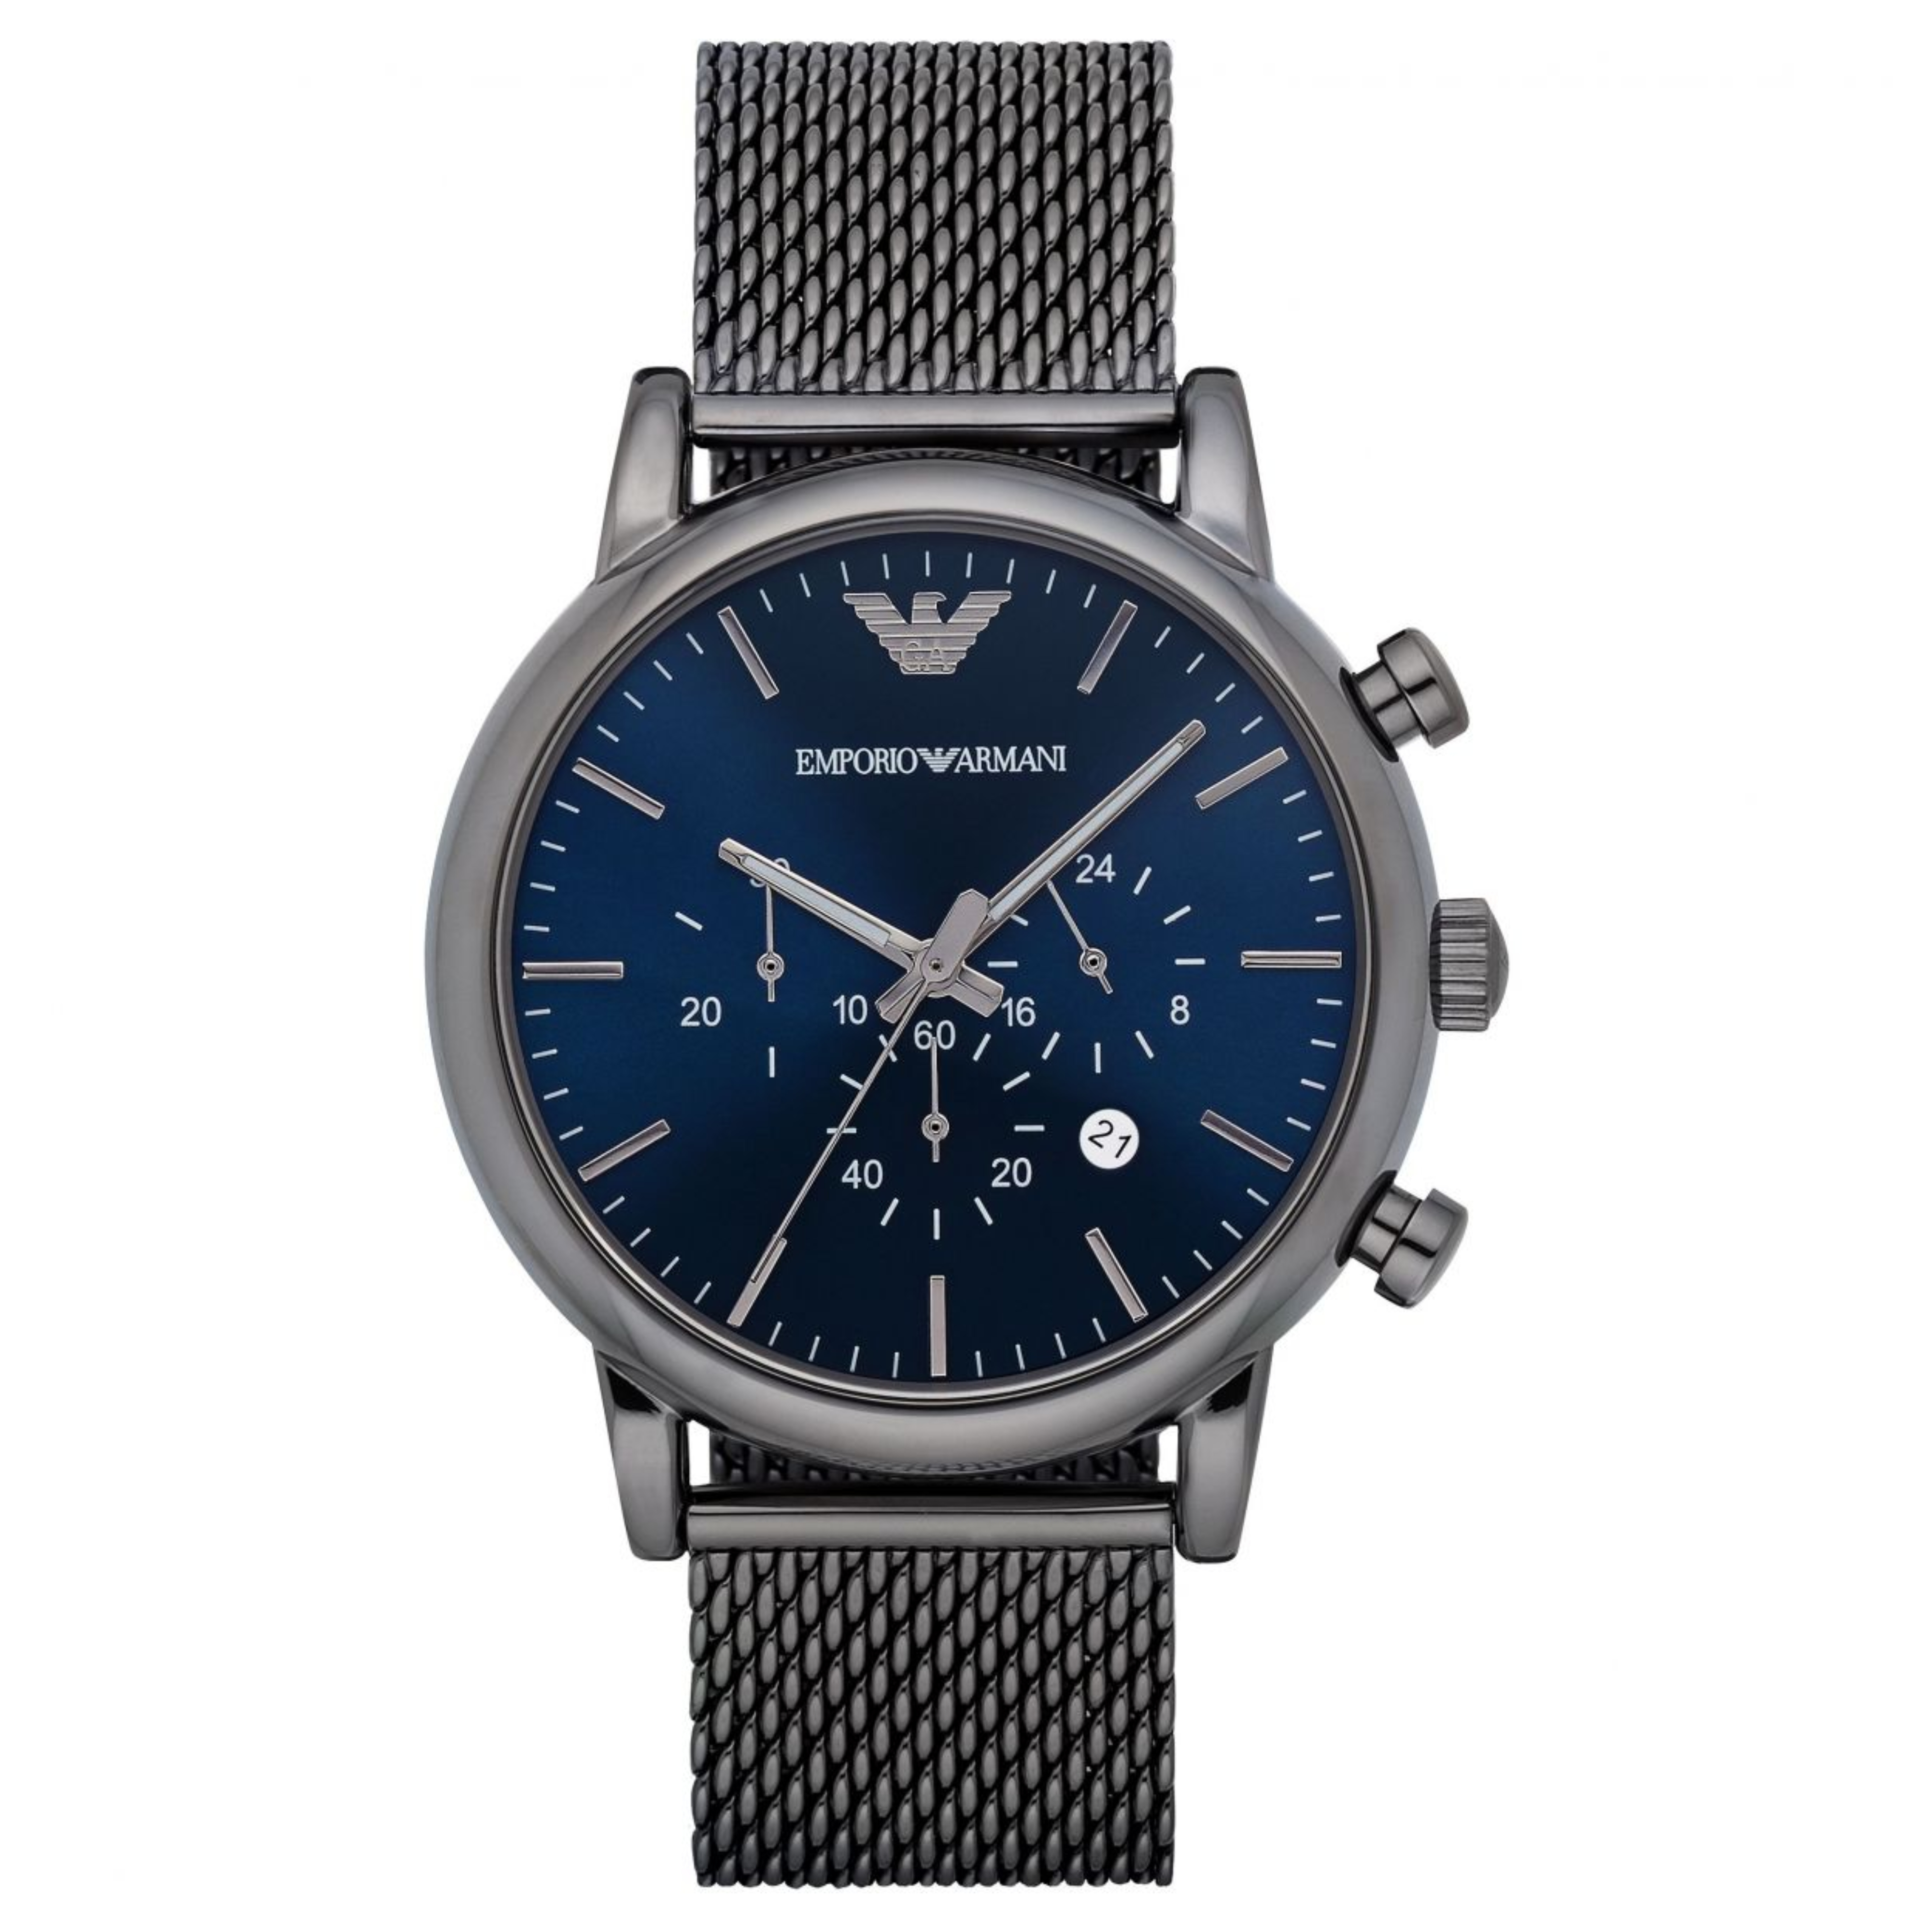 Emporio Armani Luigi Men's Watch?Chrono Dial ?Gunmetal Mesh Steel Strap?AR1979